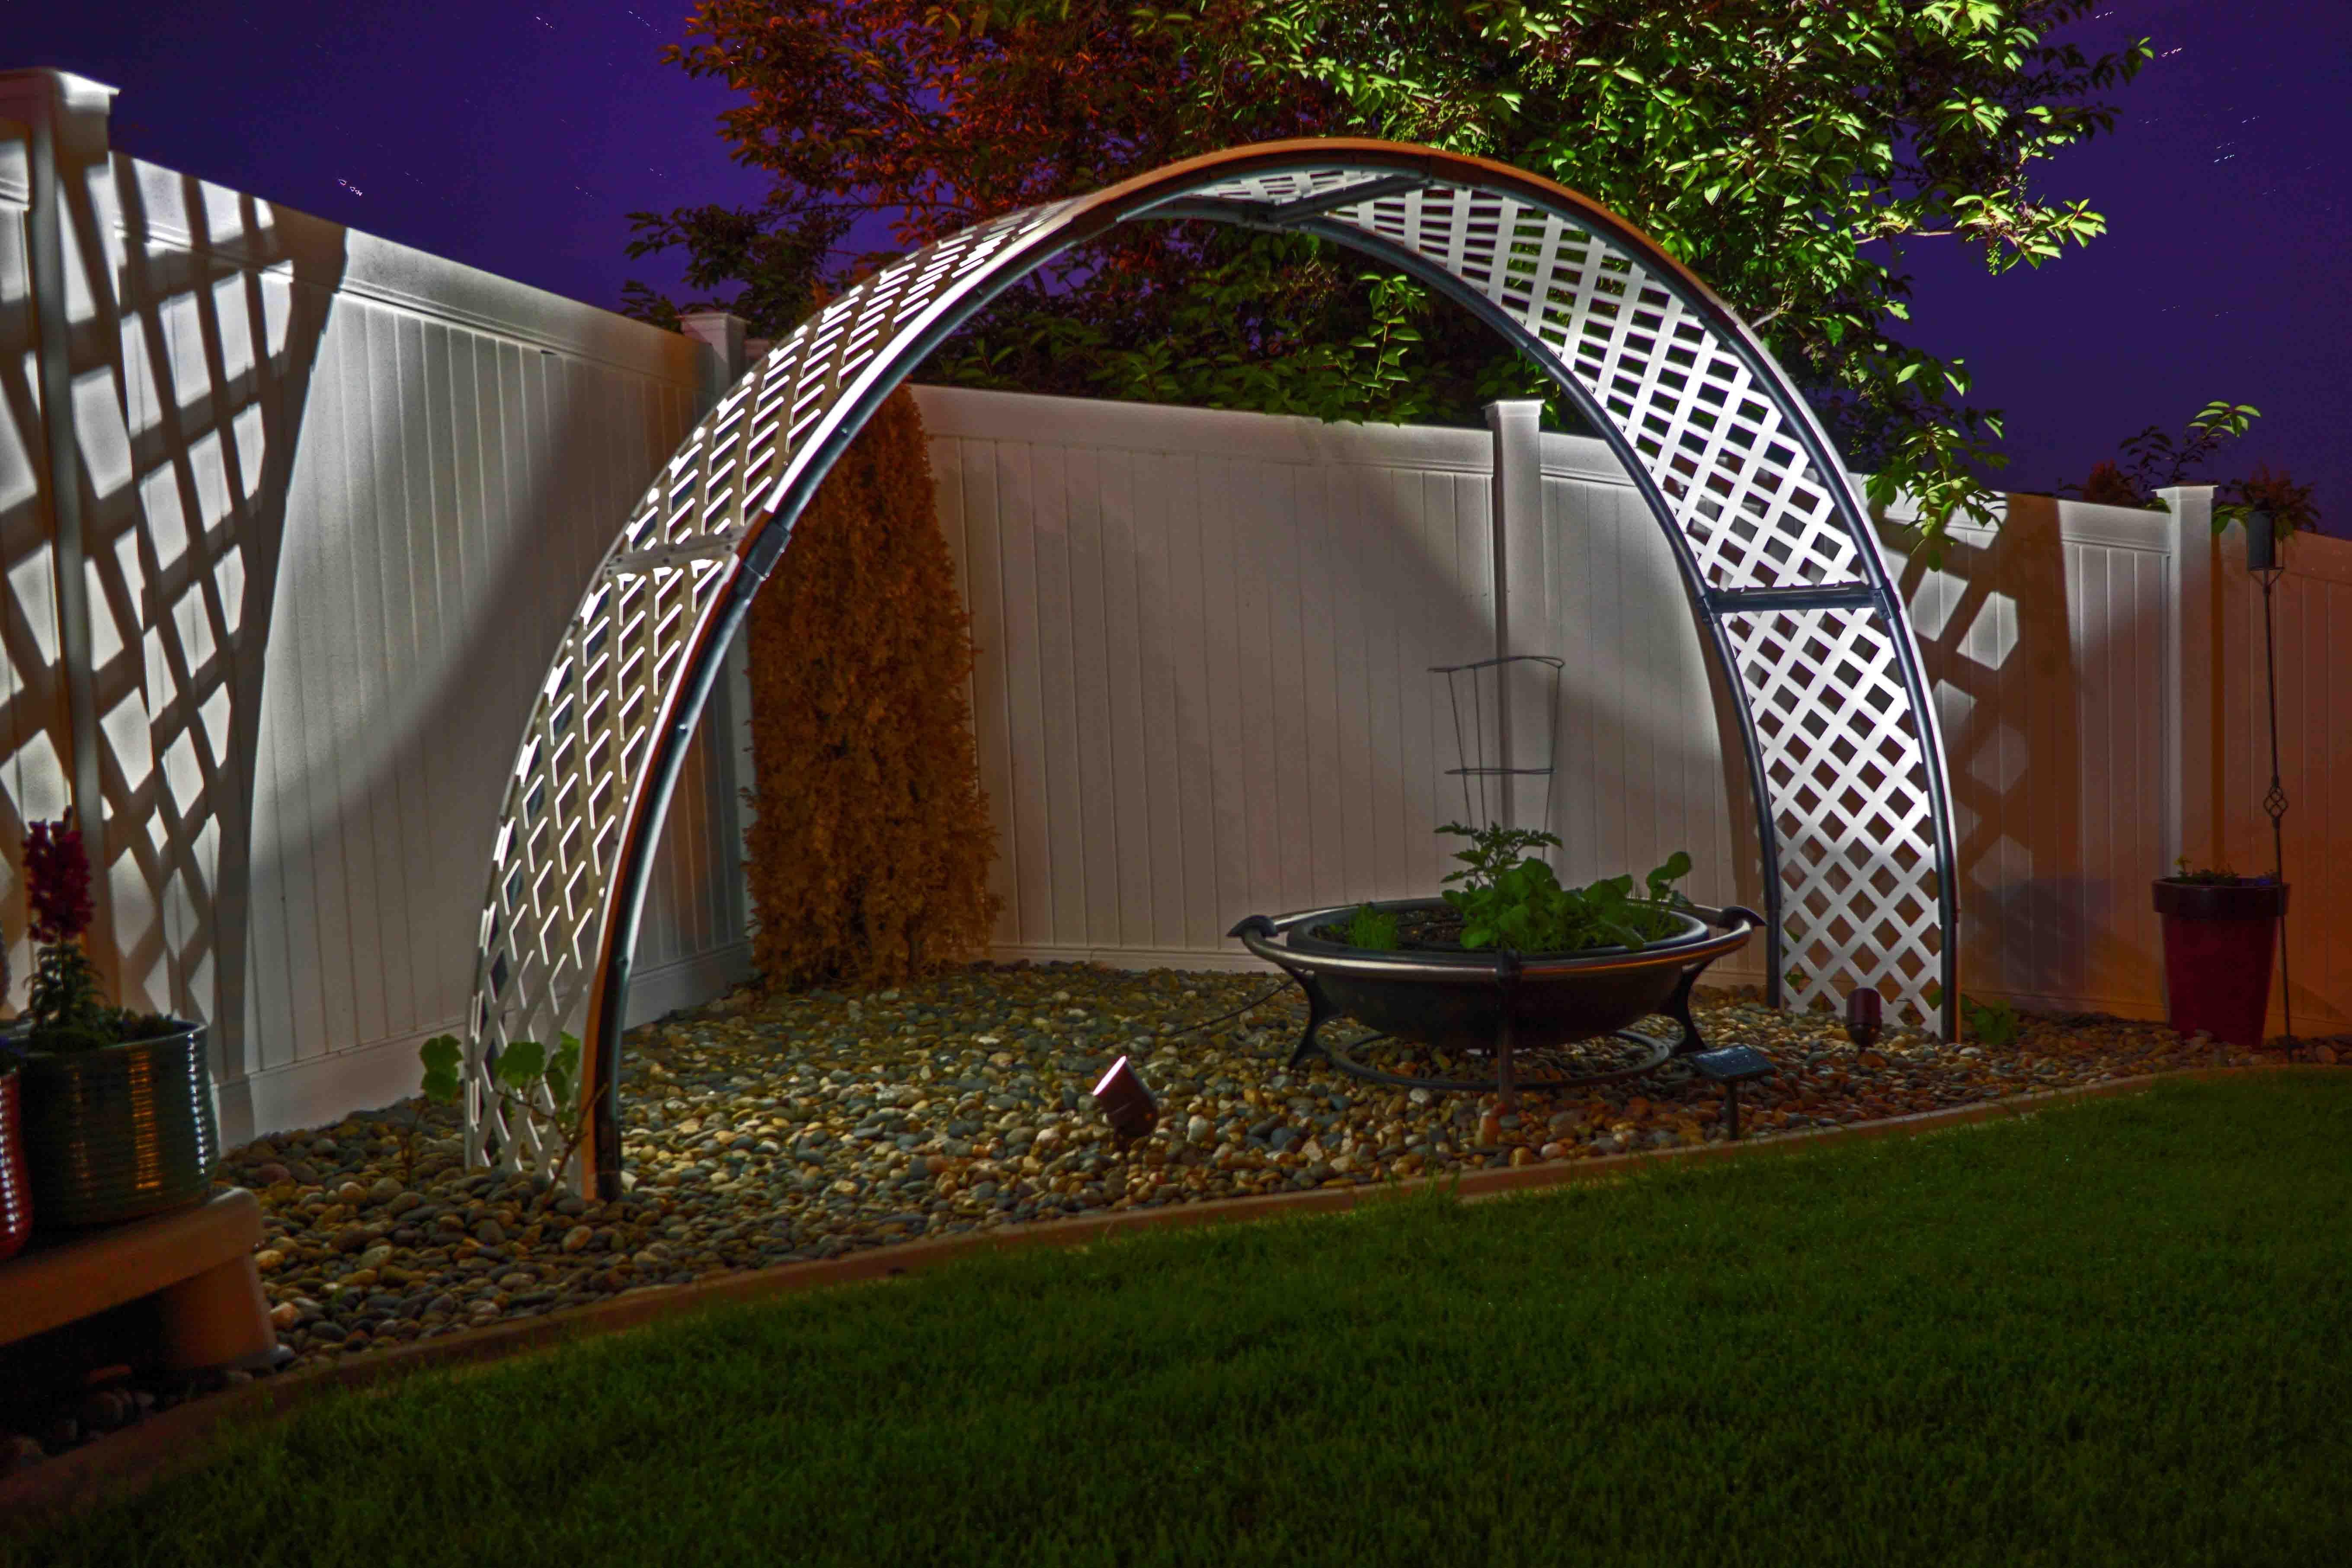 Security Check Required Hintergarten Garten Trampolin